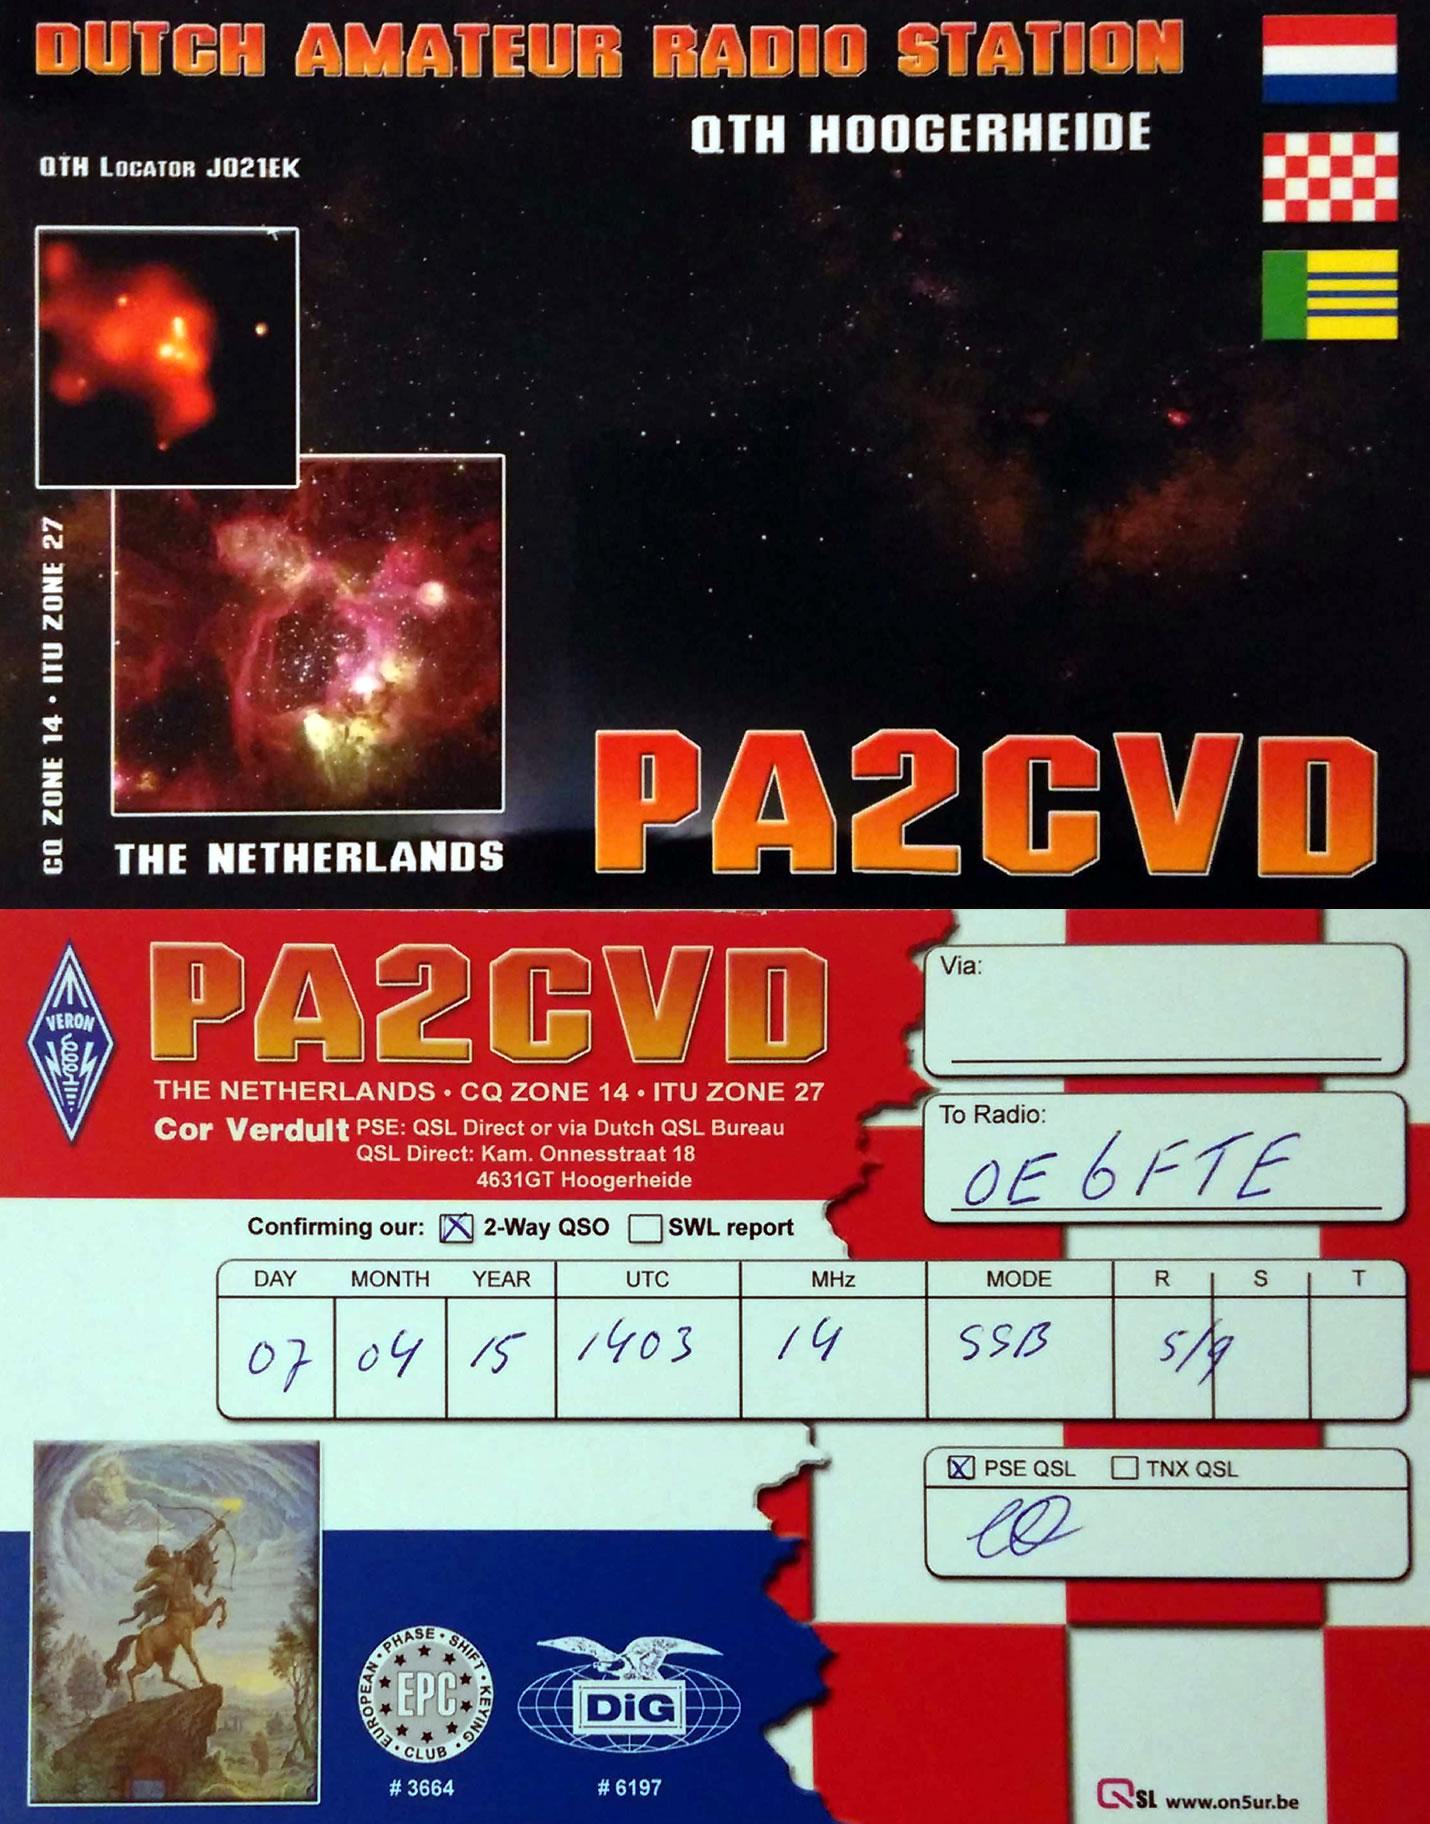 PA2CVD